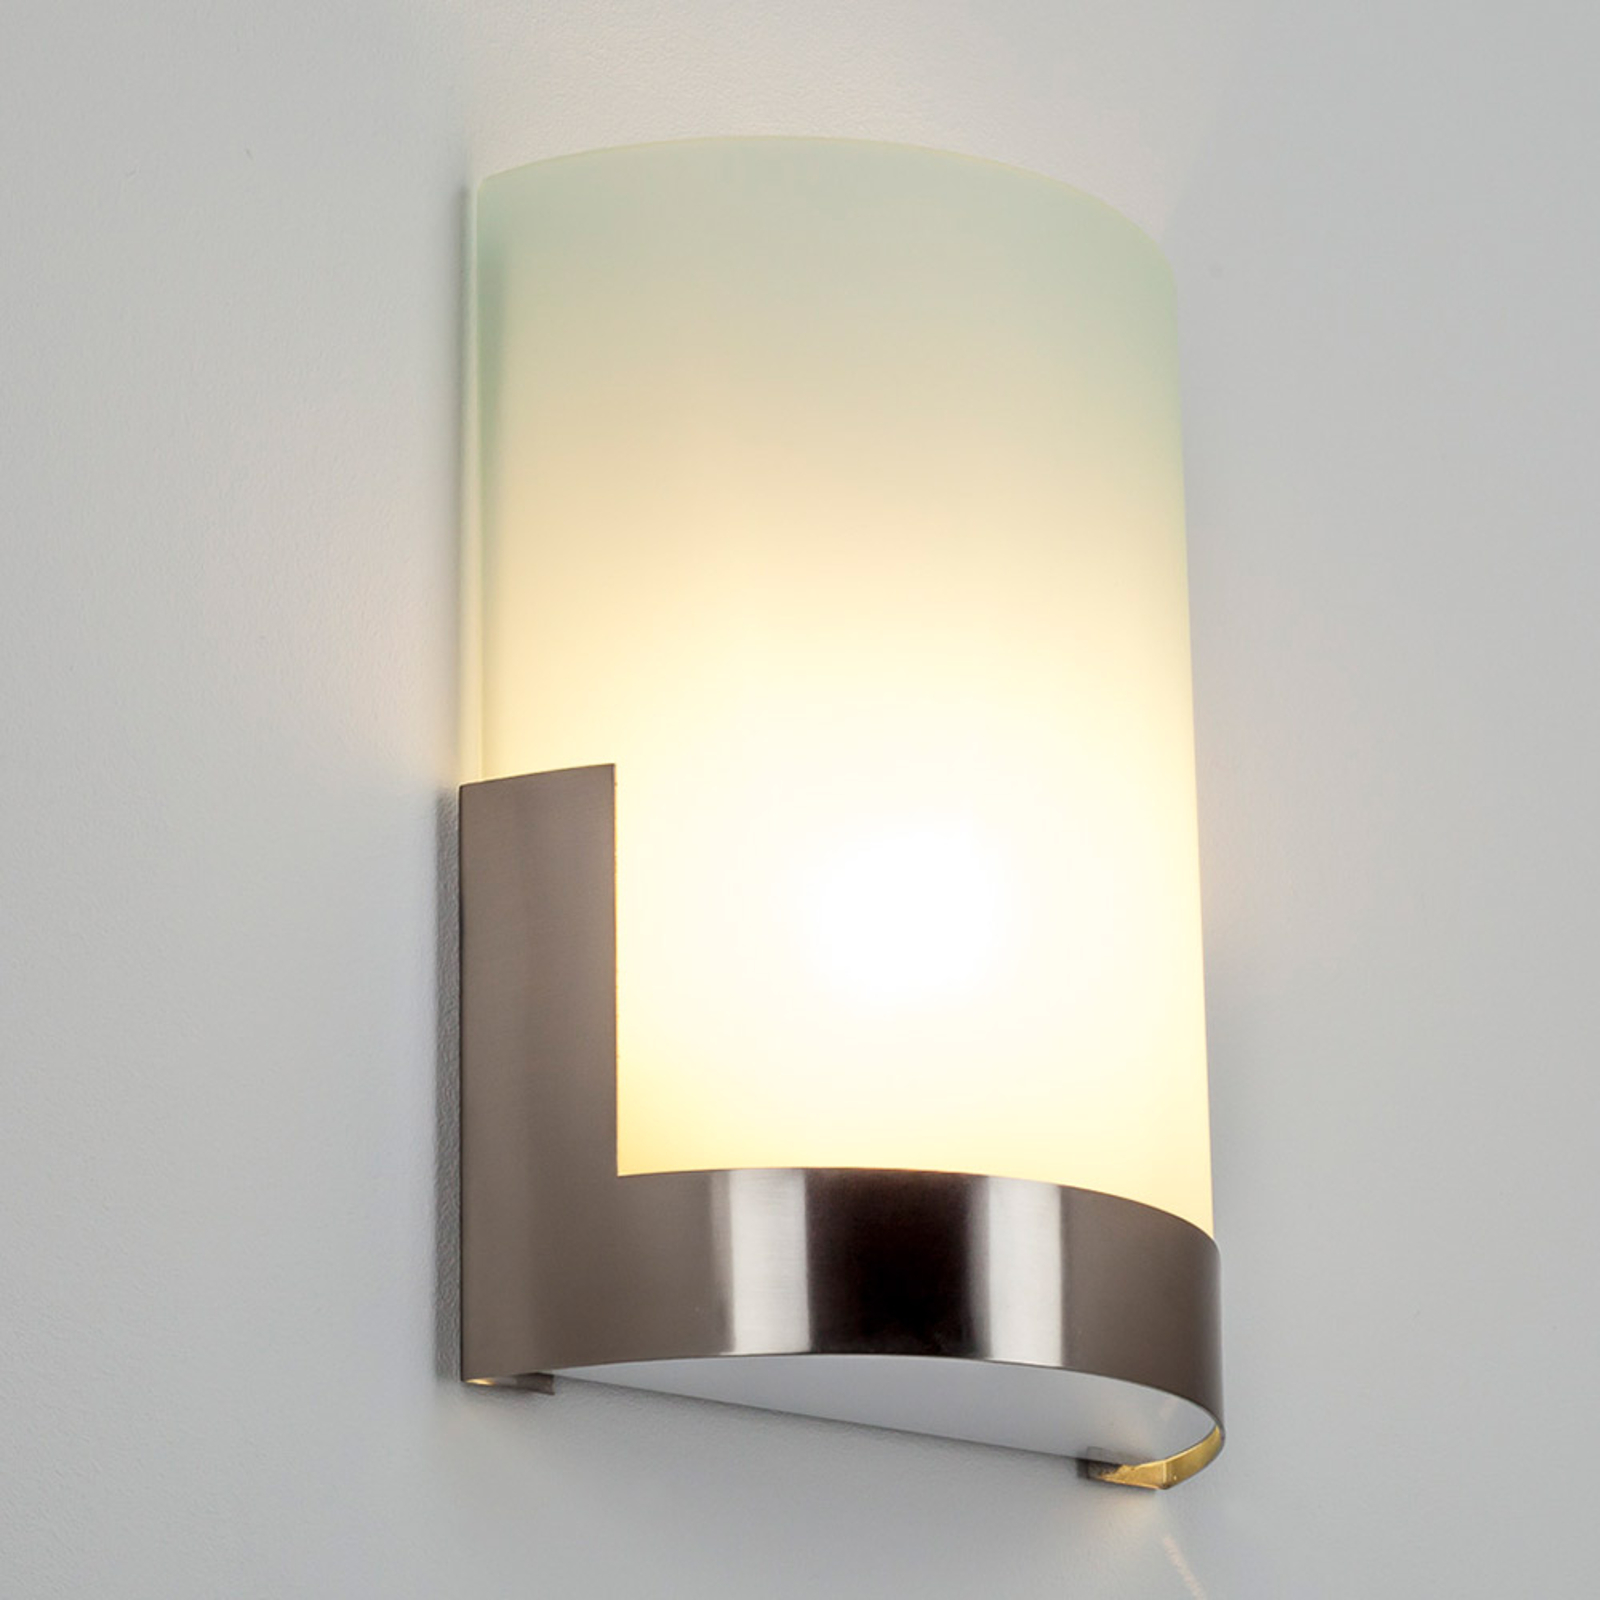 Elegante apliqueKarla con elemento metálico